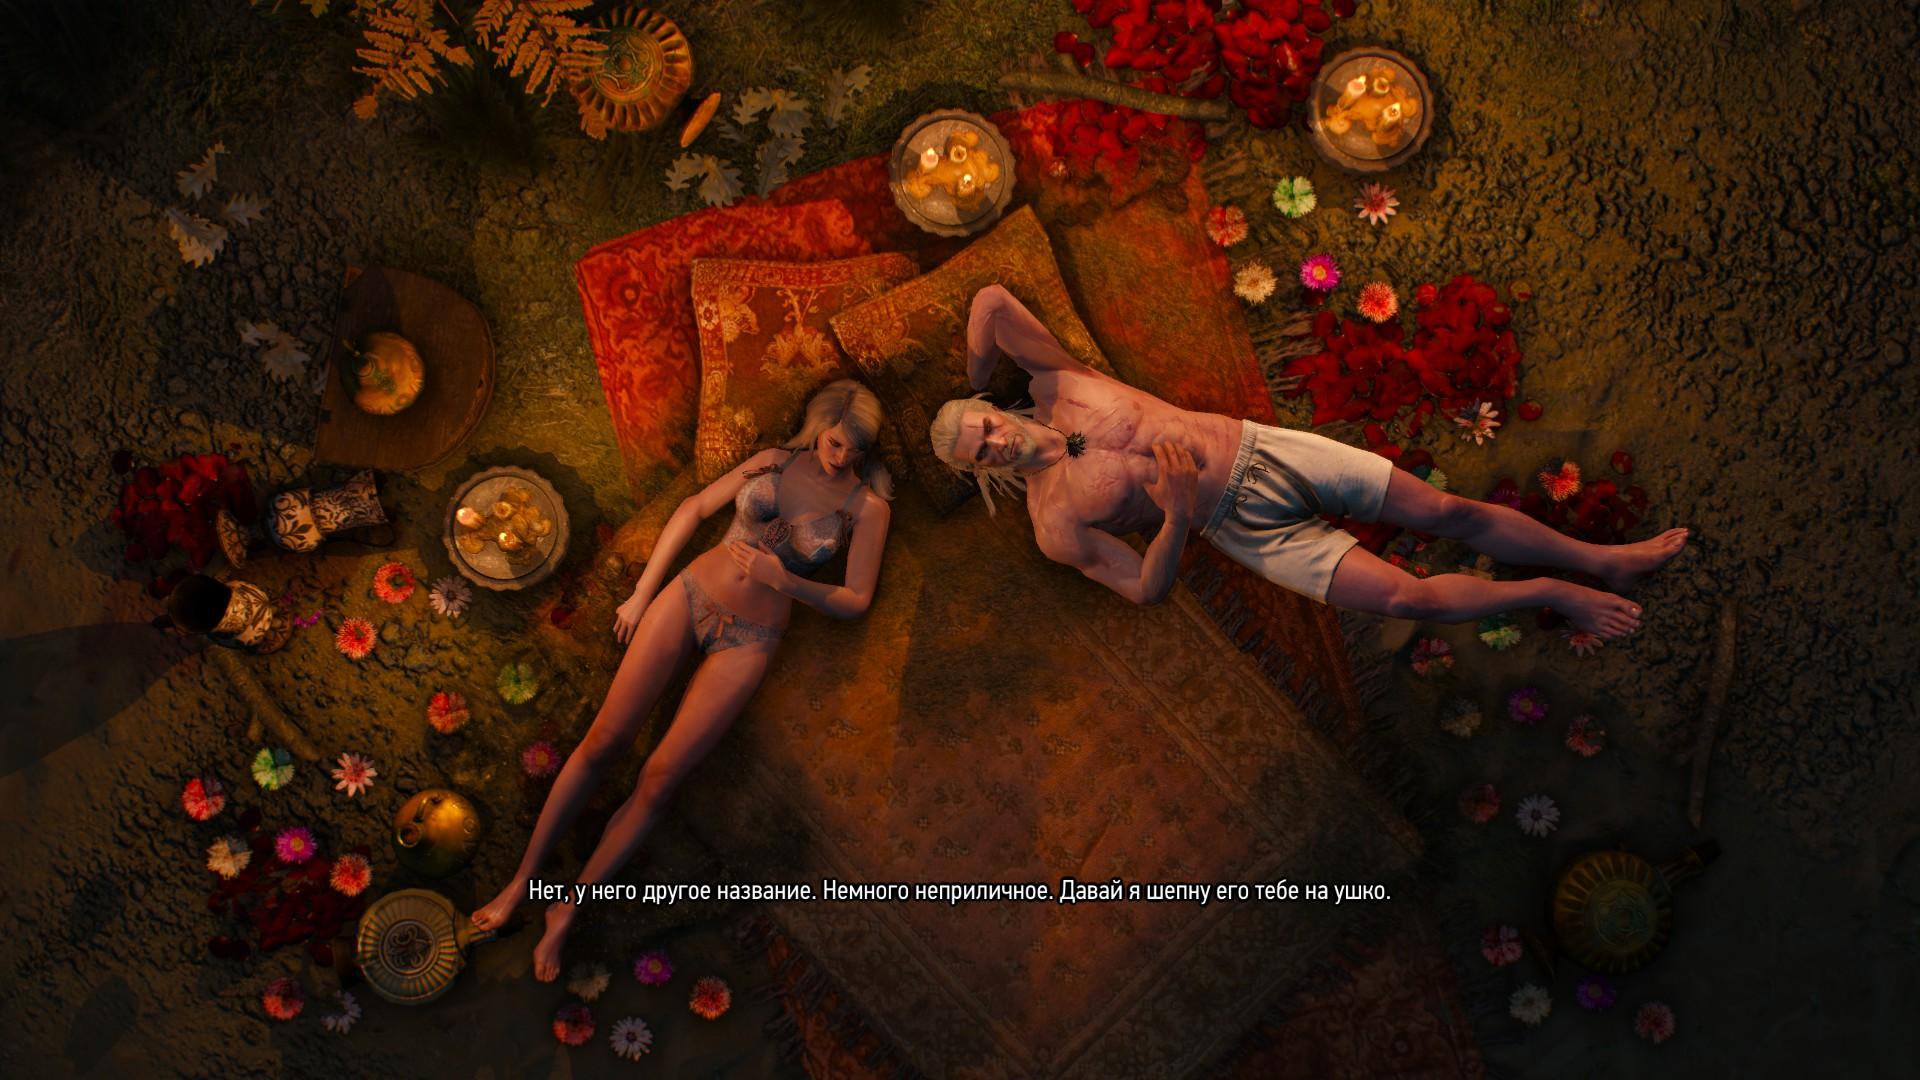 292030_screenshots_20171107212703_1.jpg - Witcher 3: Wild Hunt, the